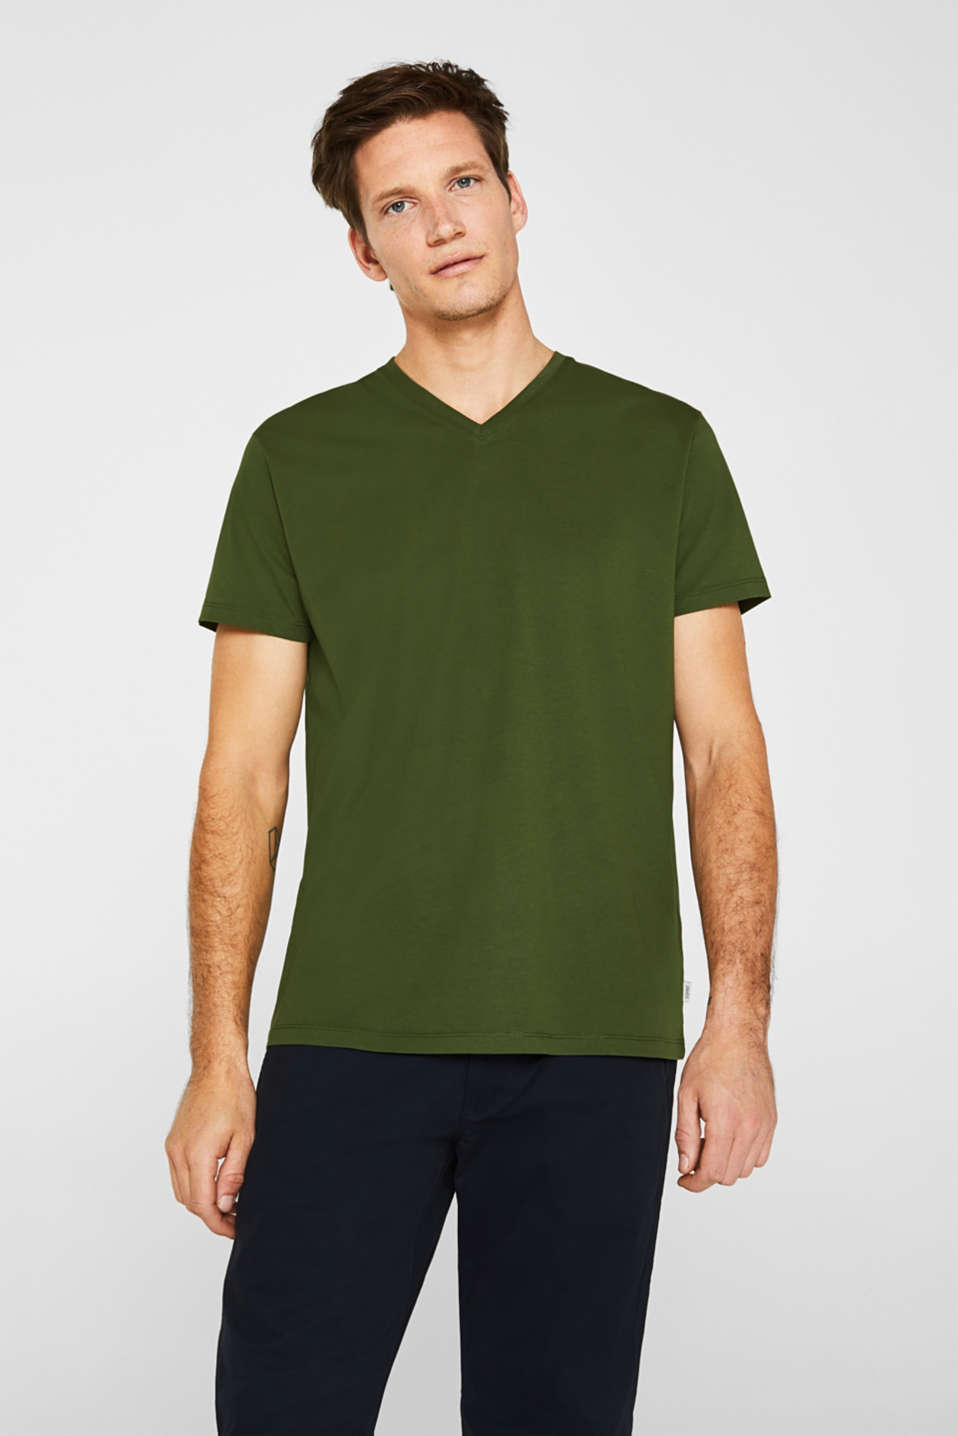 Jersey T-shirt in 100% cotton, KHAKI GREEN, detail image number 0